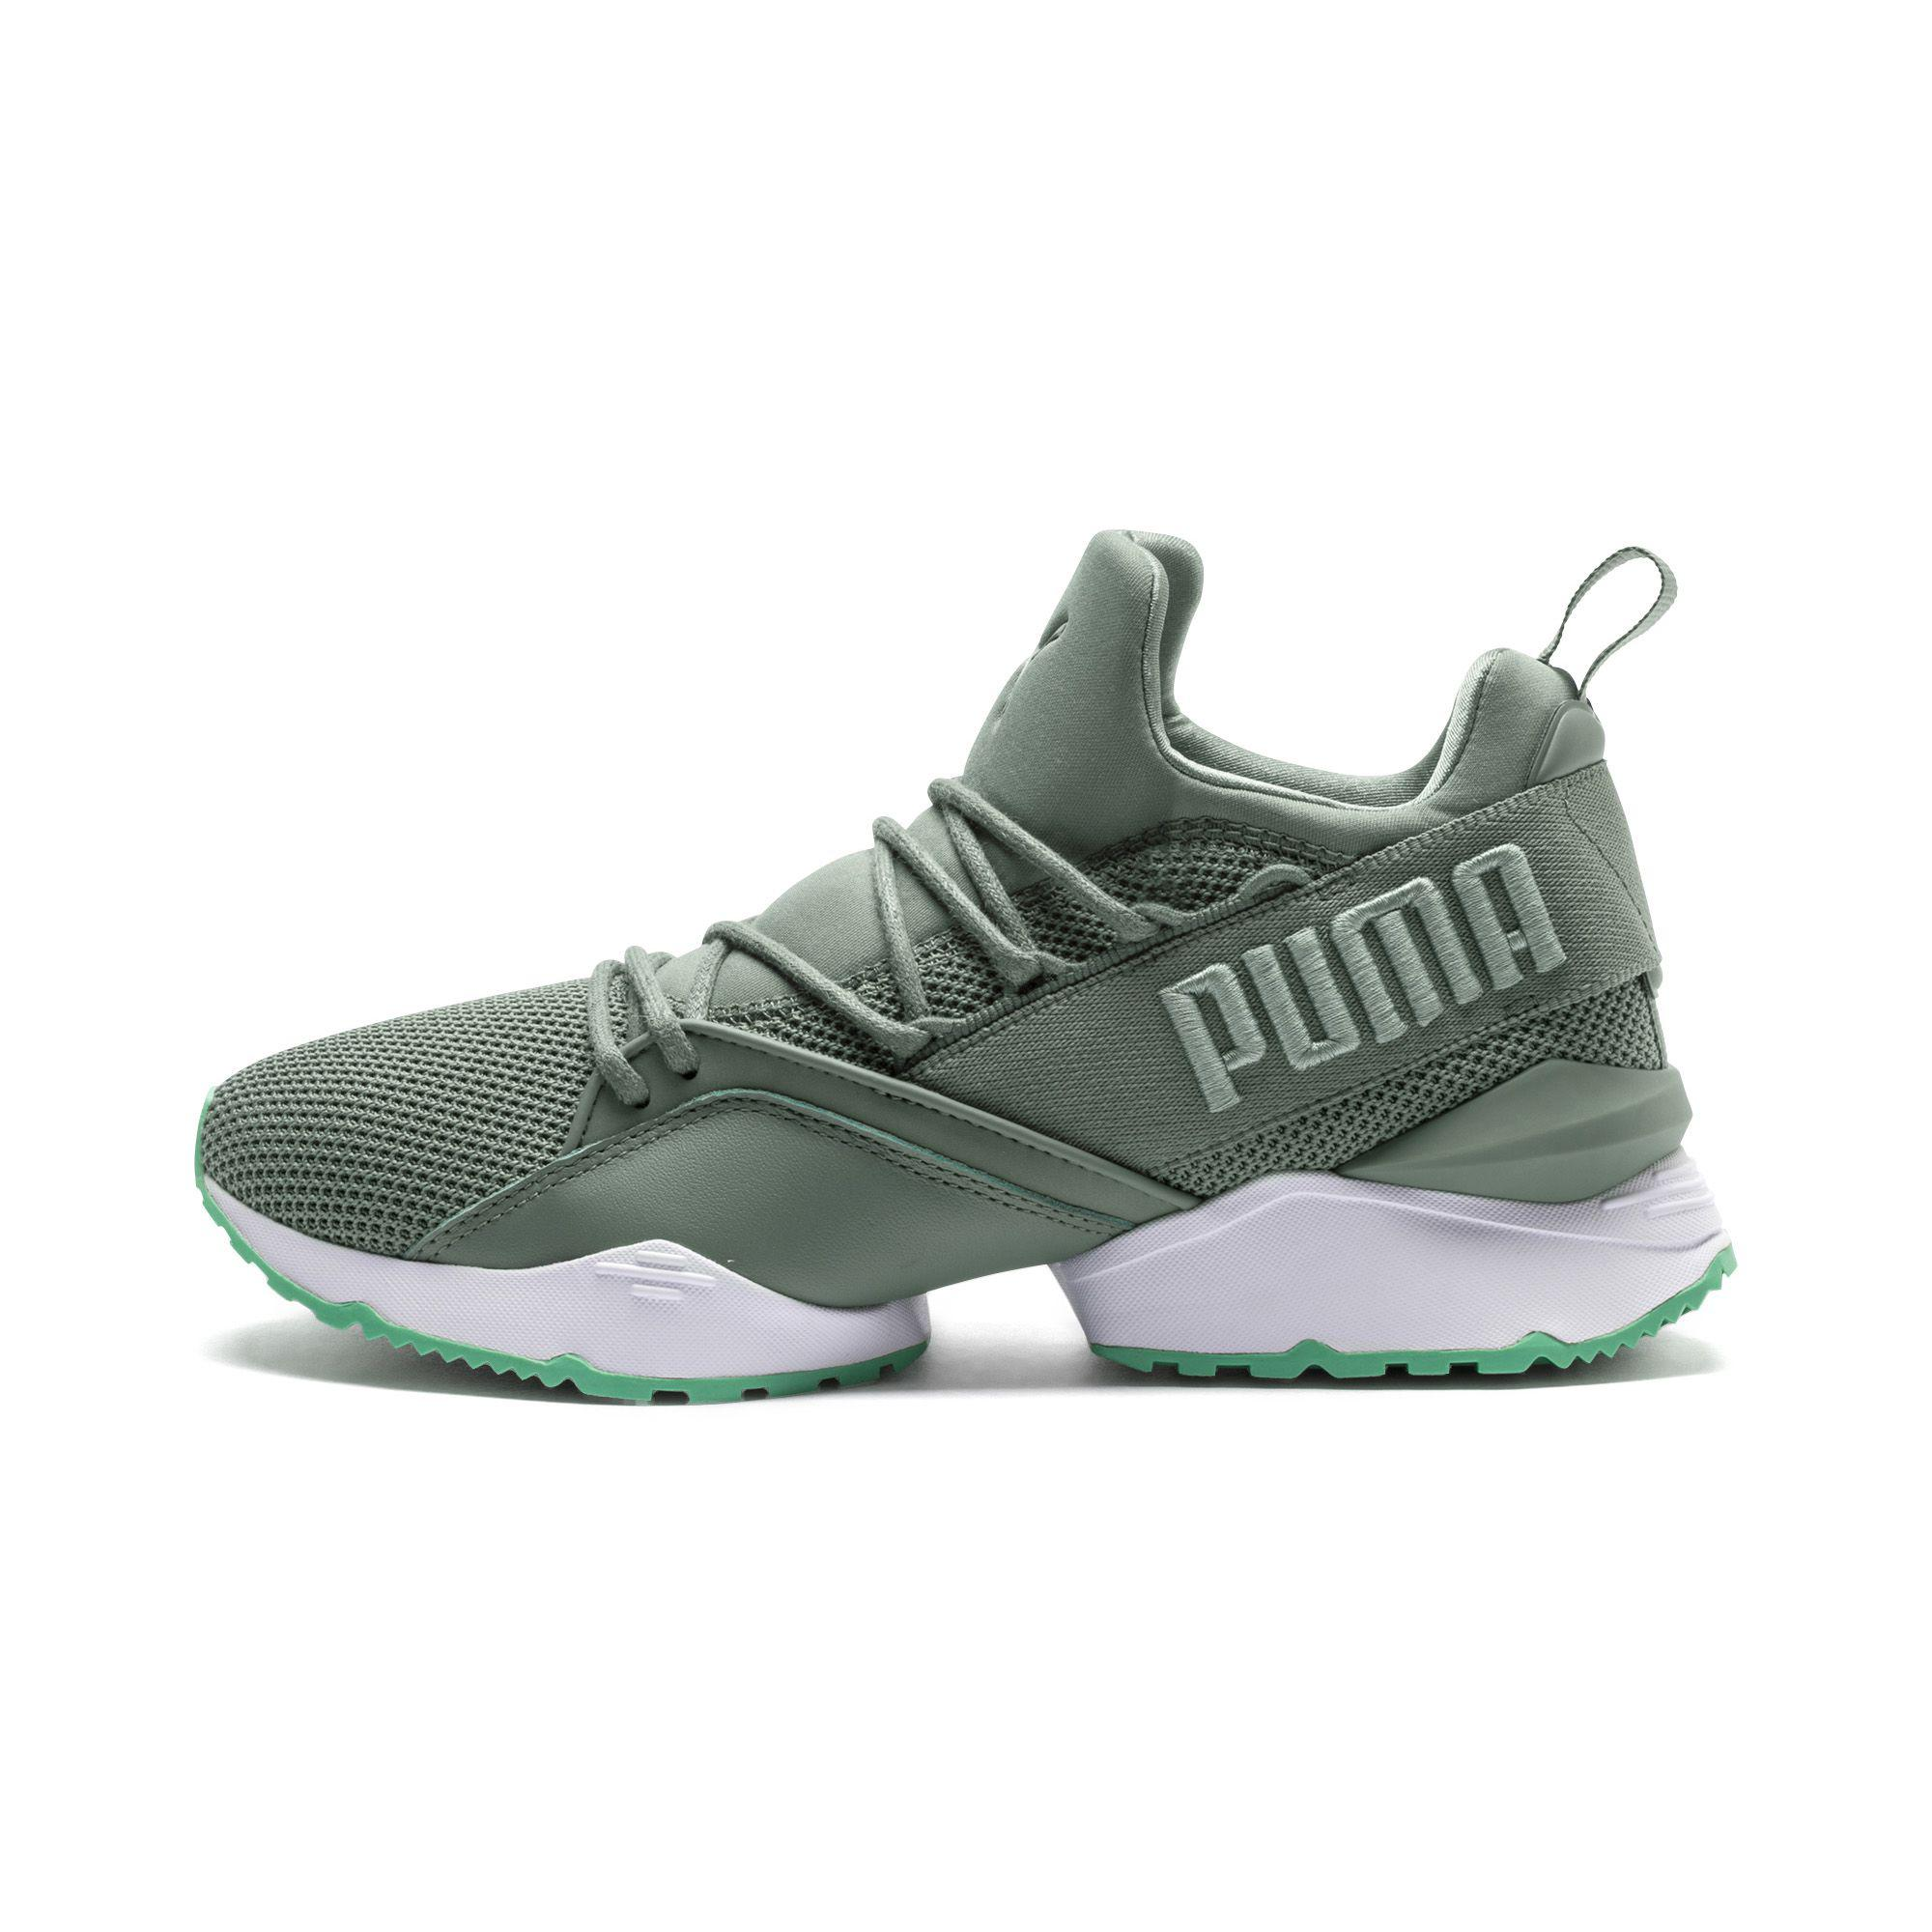 5551b57cc42 Lyst - PUMA Muse Maia Street 2 Women s Sneakers in Green